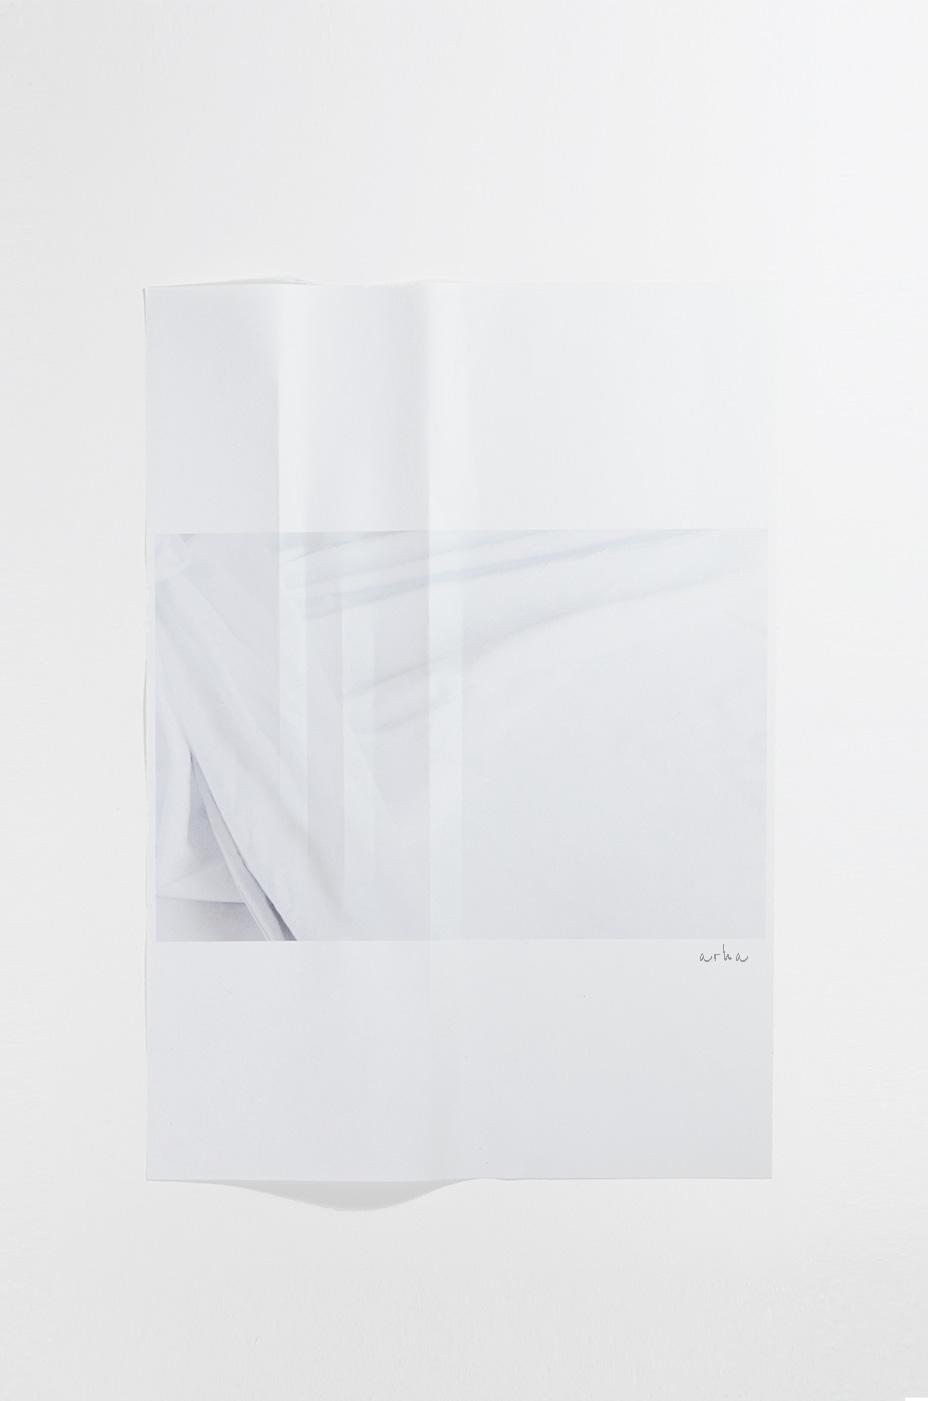 Wind-of-the-south-island-minimalism-copyright-2013-arha-Tomomichi-Morifuji